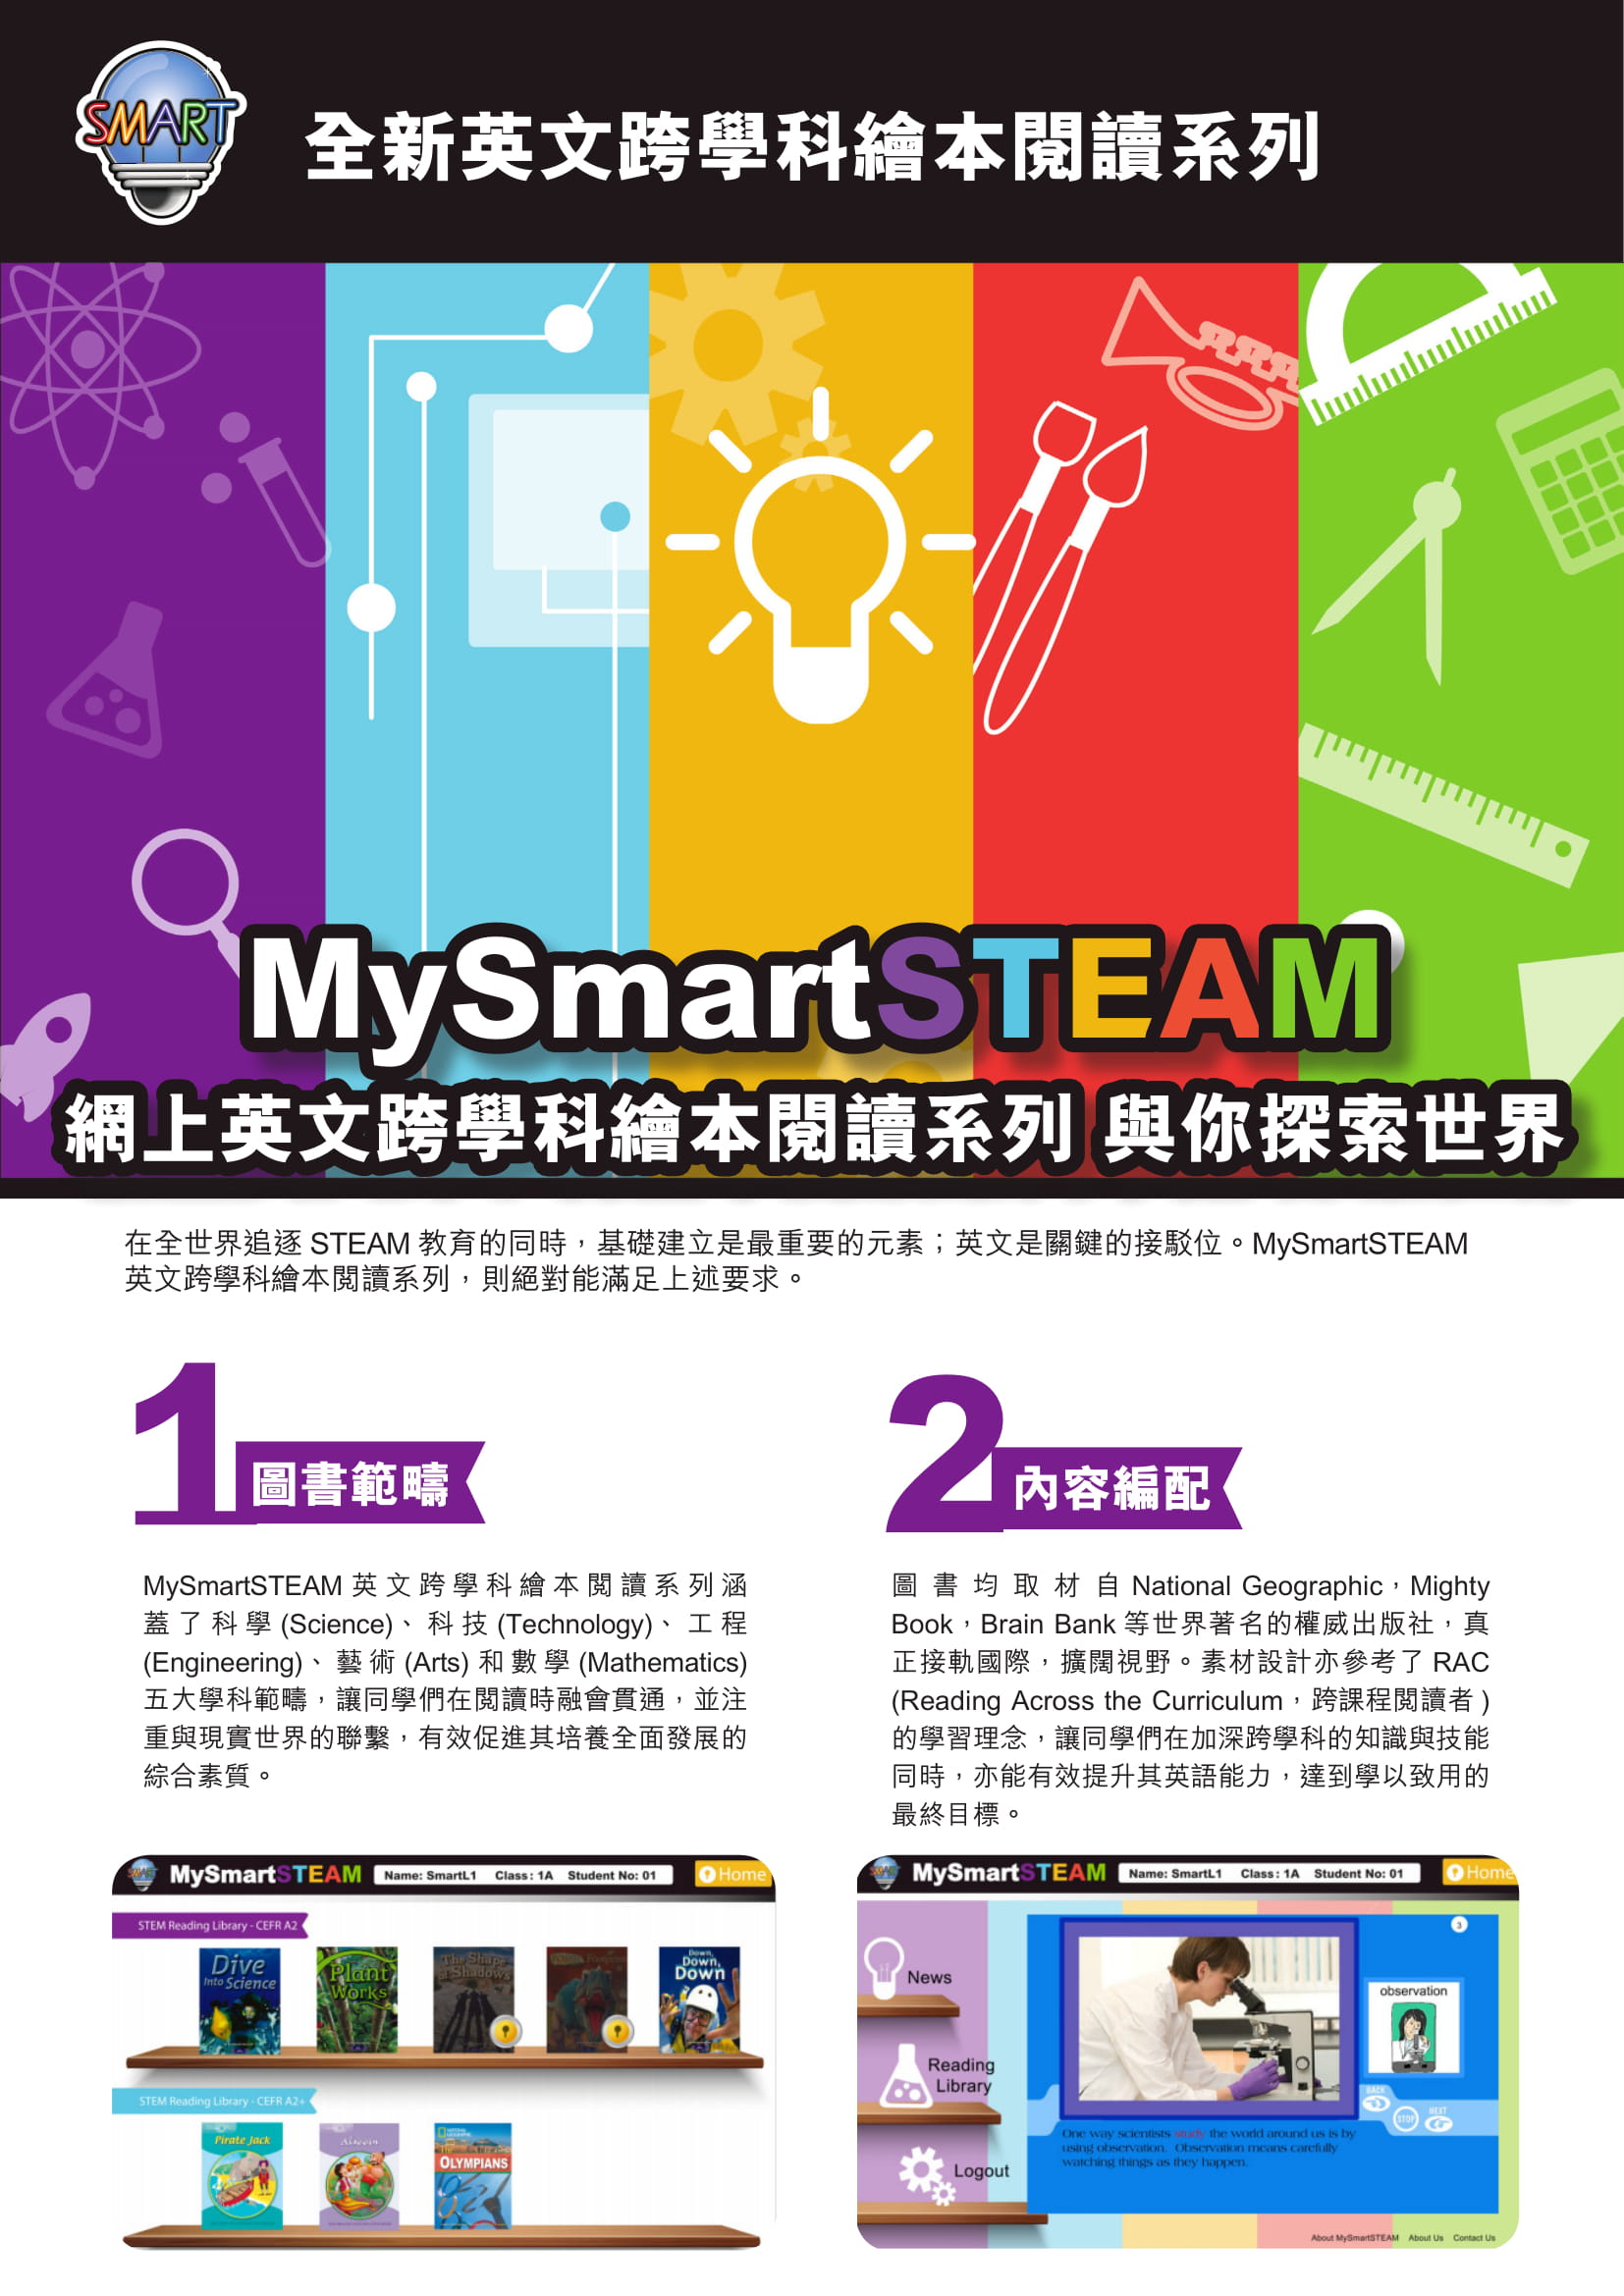 MySmartSTEAM Intro P1-1